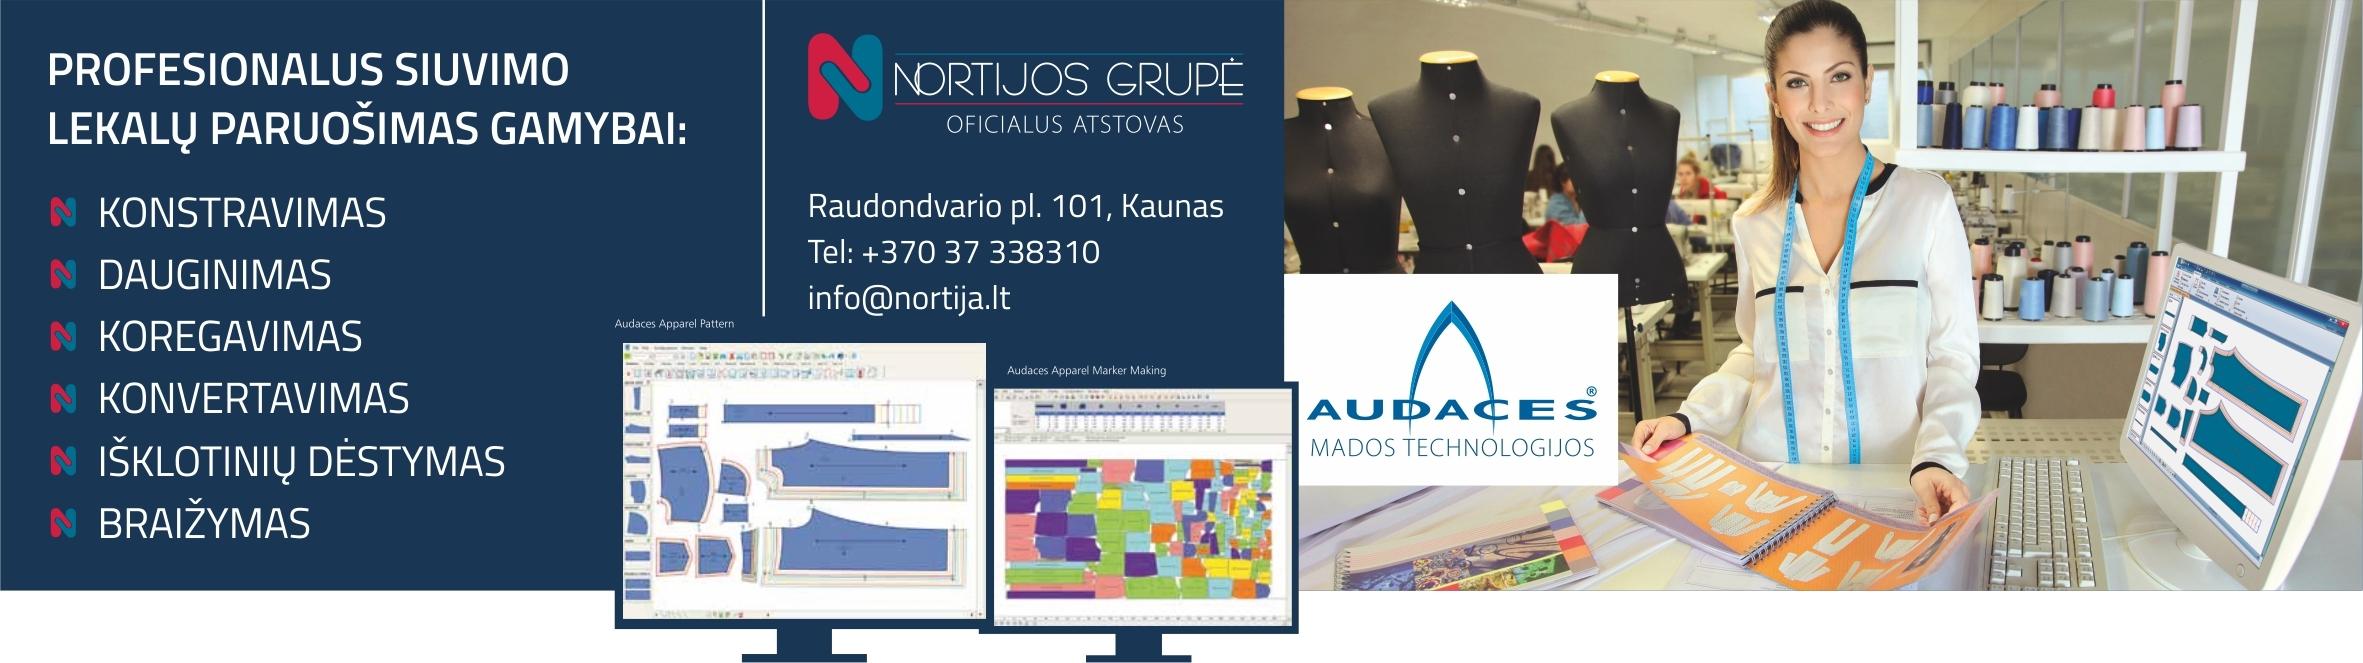 Audaces reklama 2015 01-3